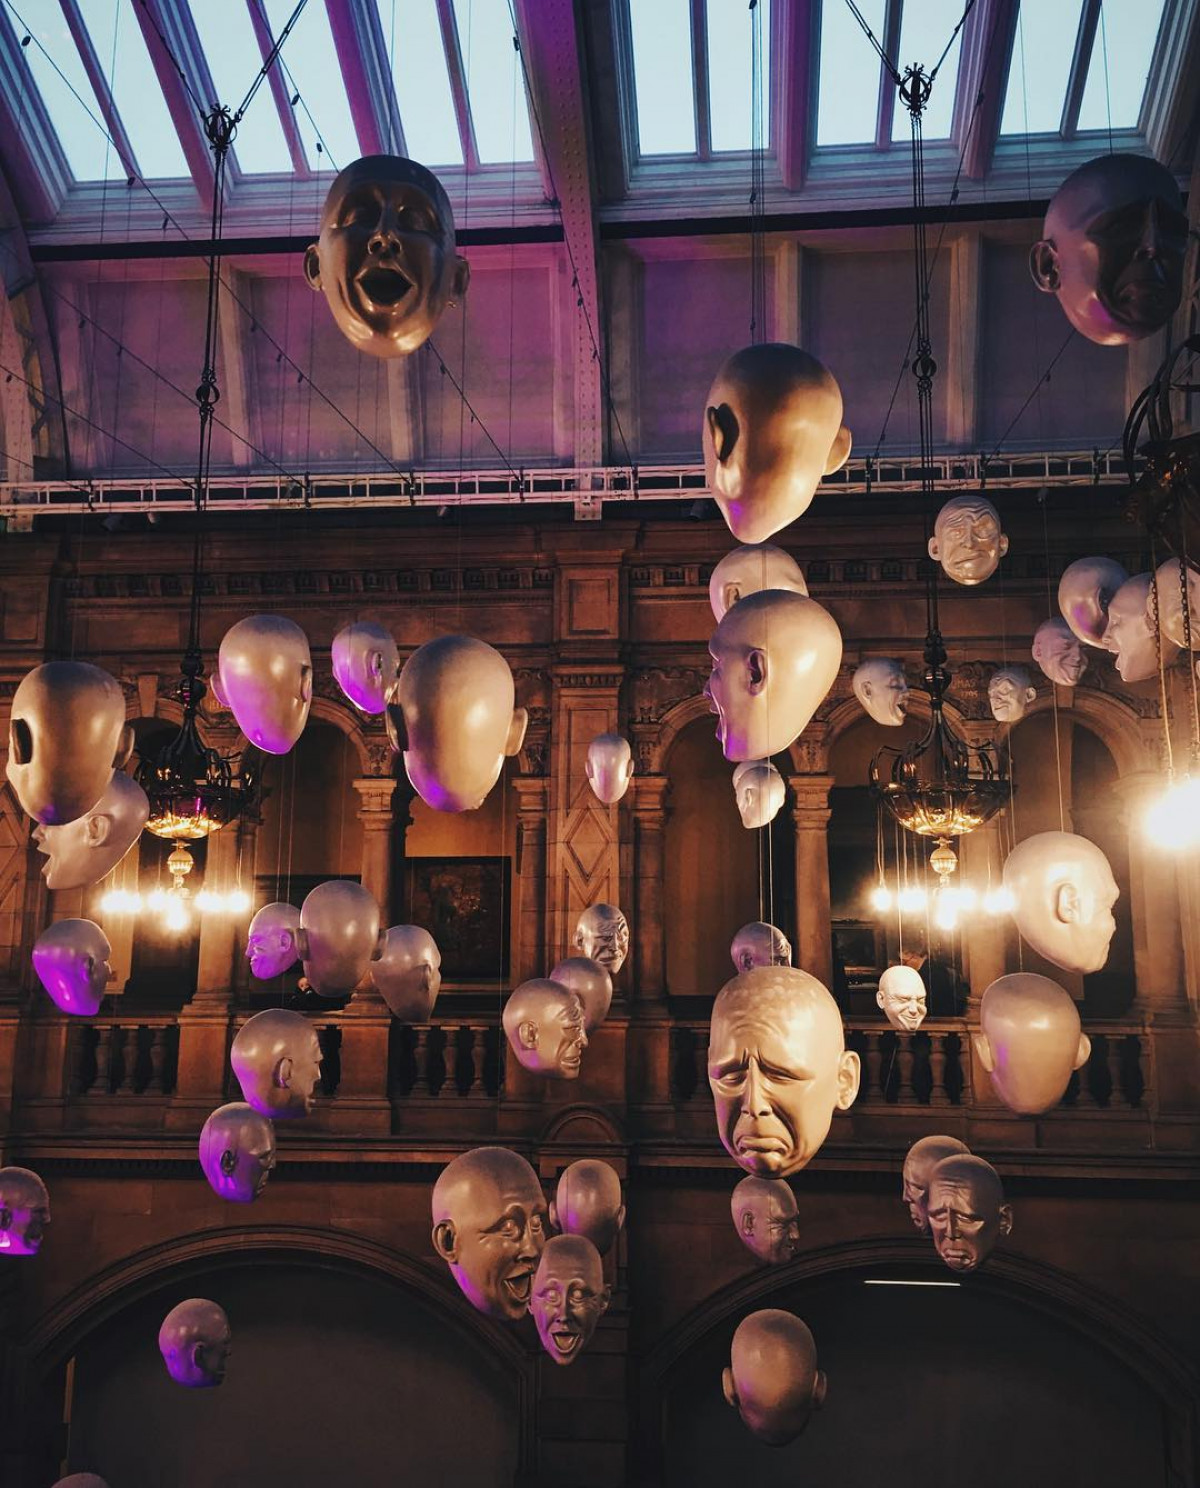 Kelvingrove Art Gallery Museum Glasgow credit aquinashyacinth